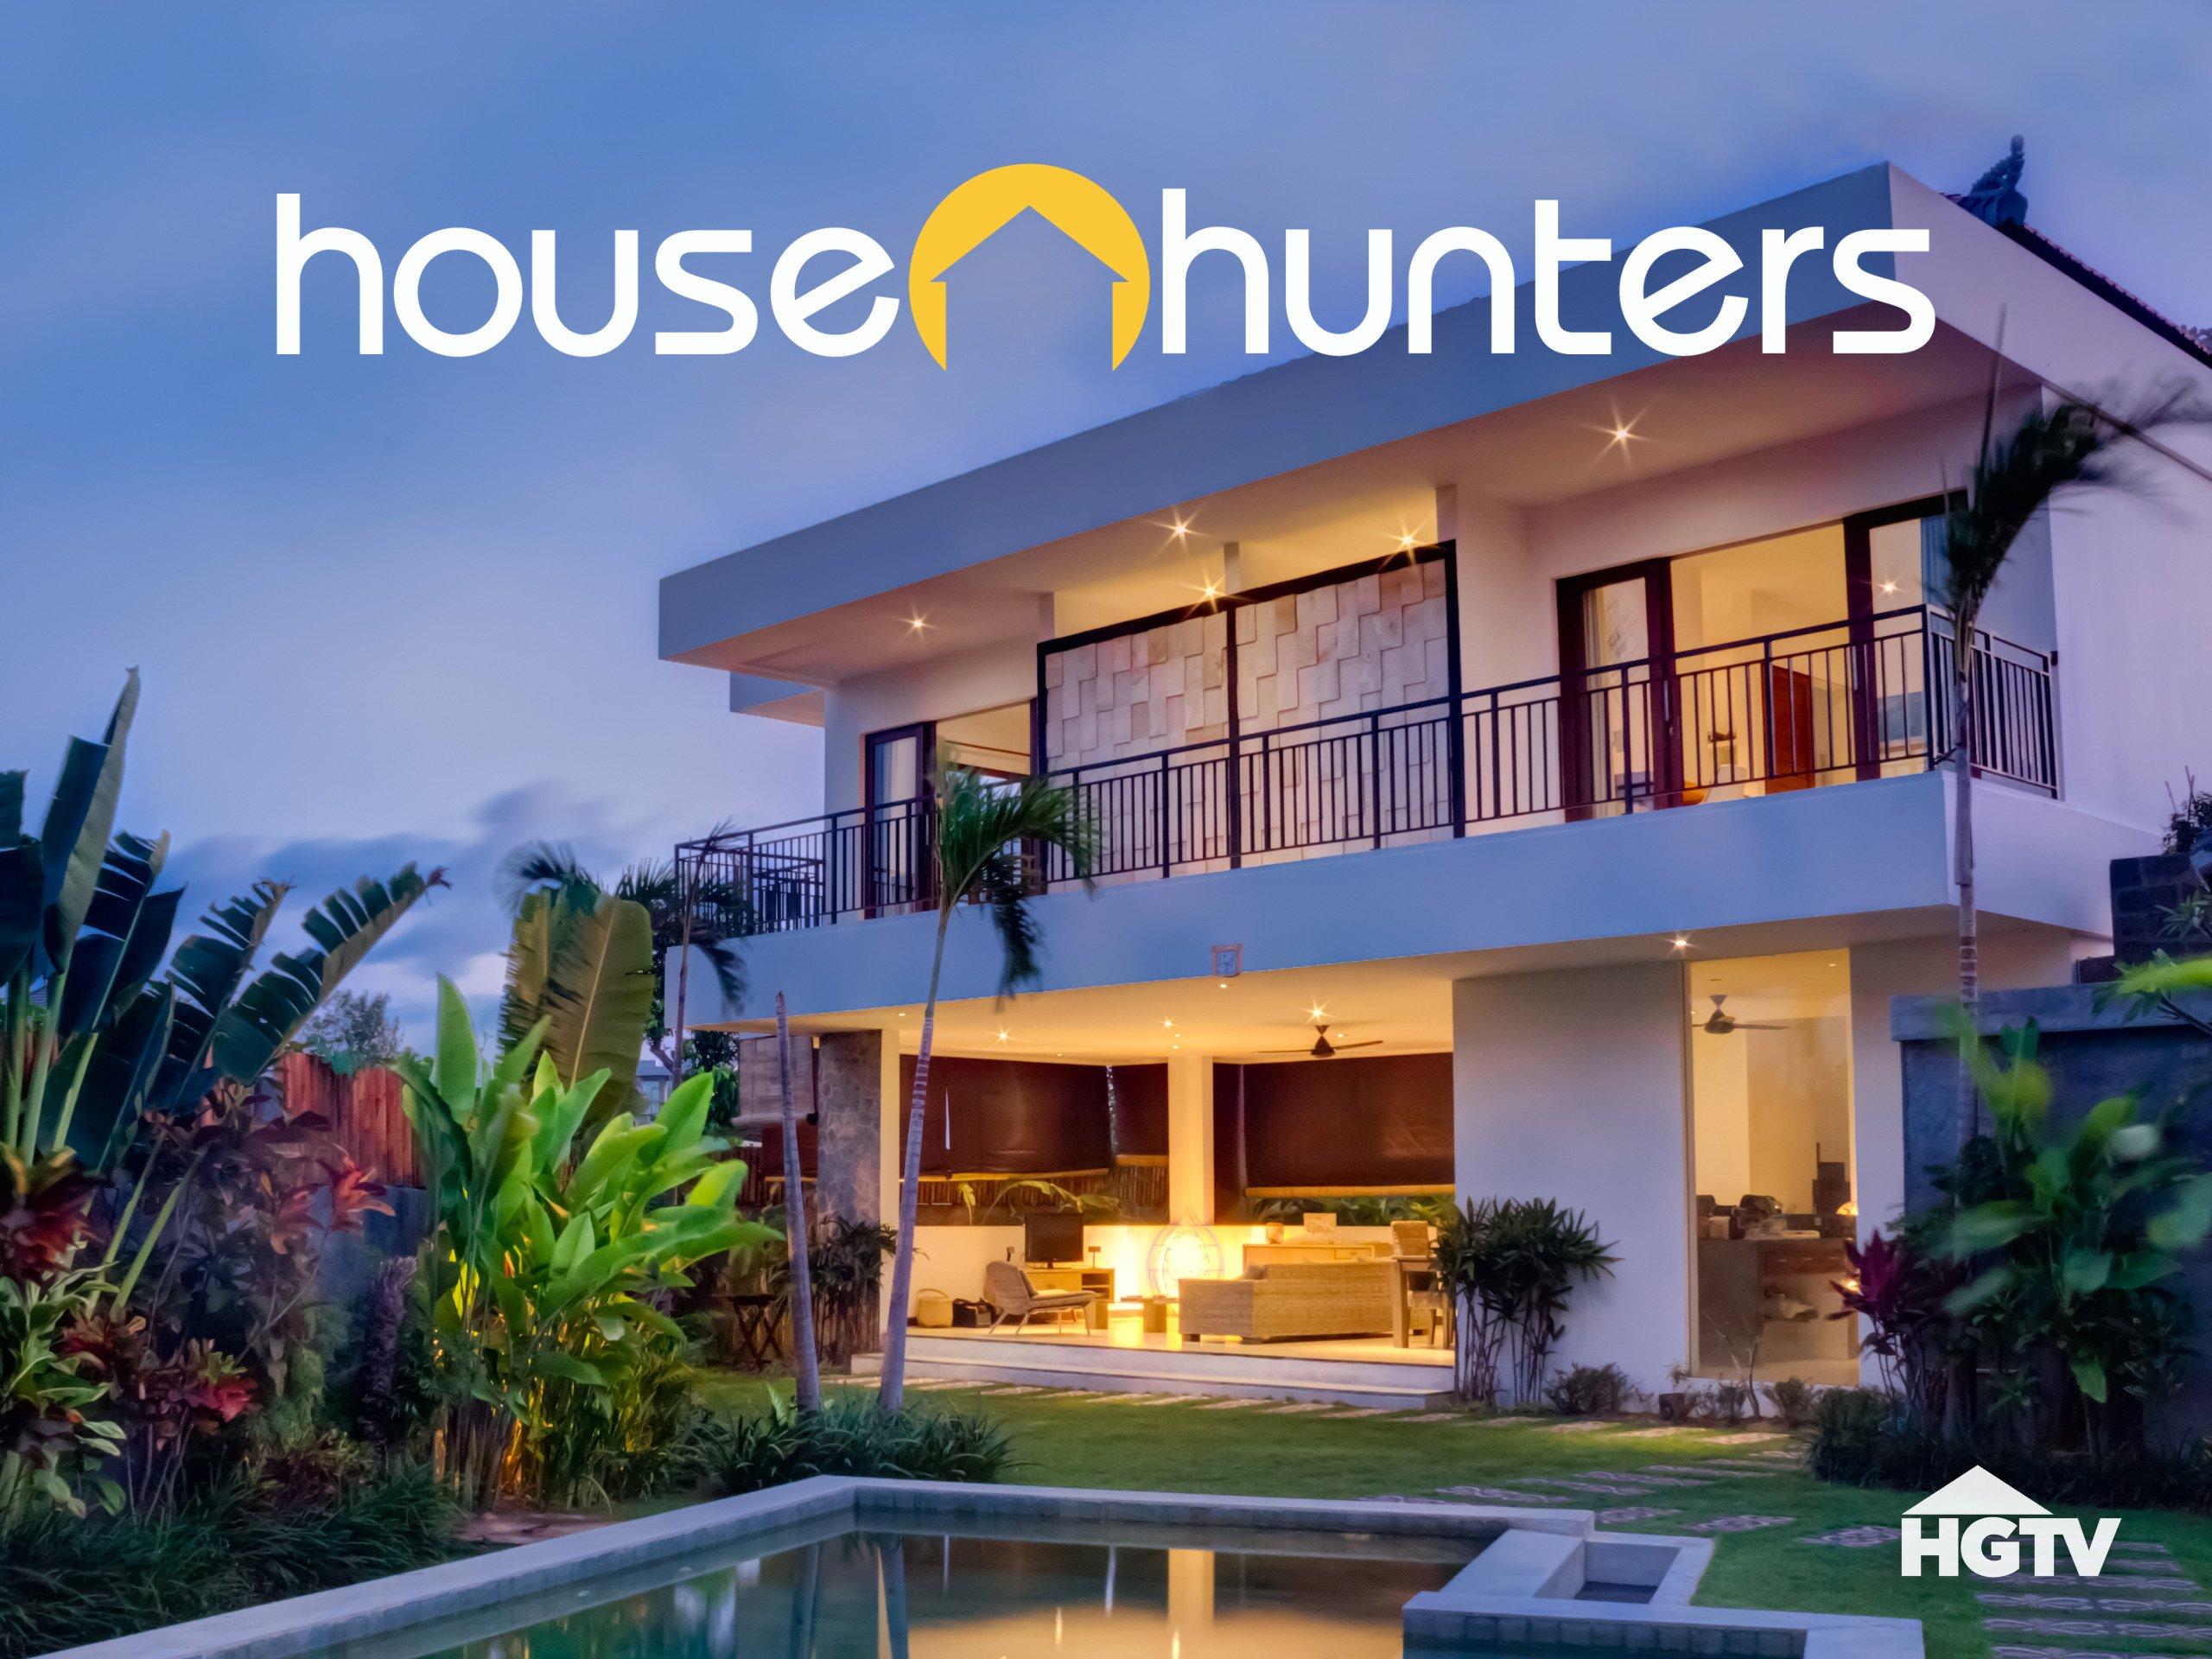 Amazoncom House Hunters Season 105 Amazon